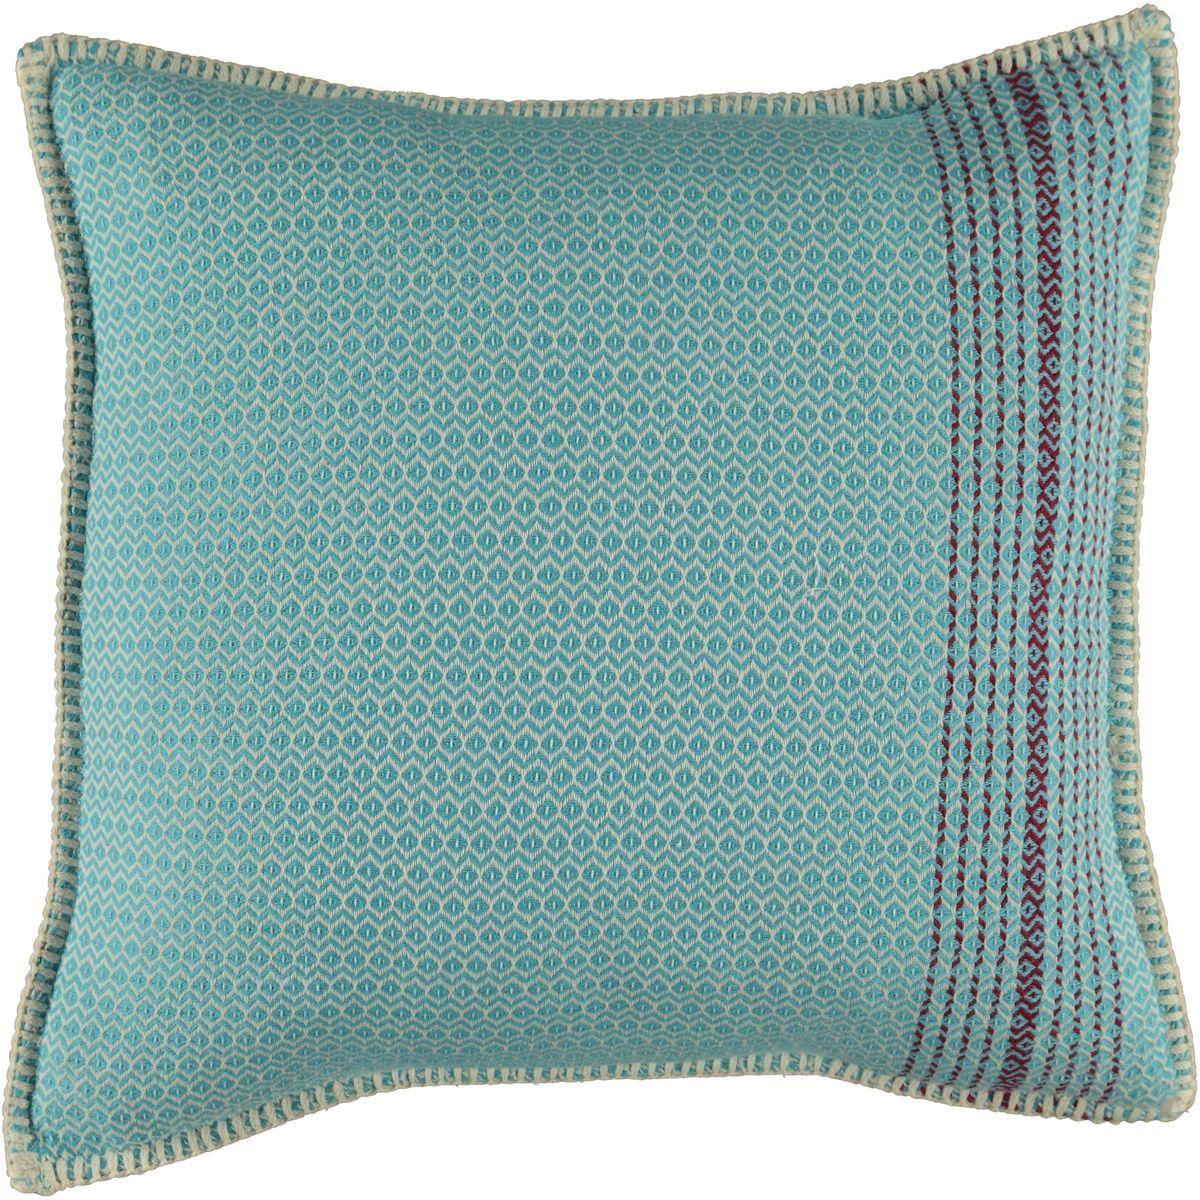 Cushion Cover / Gocek - Turquoise 40x40